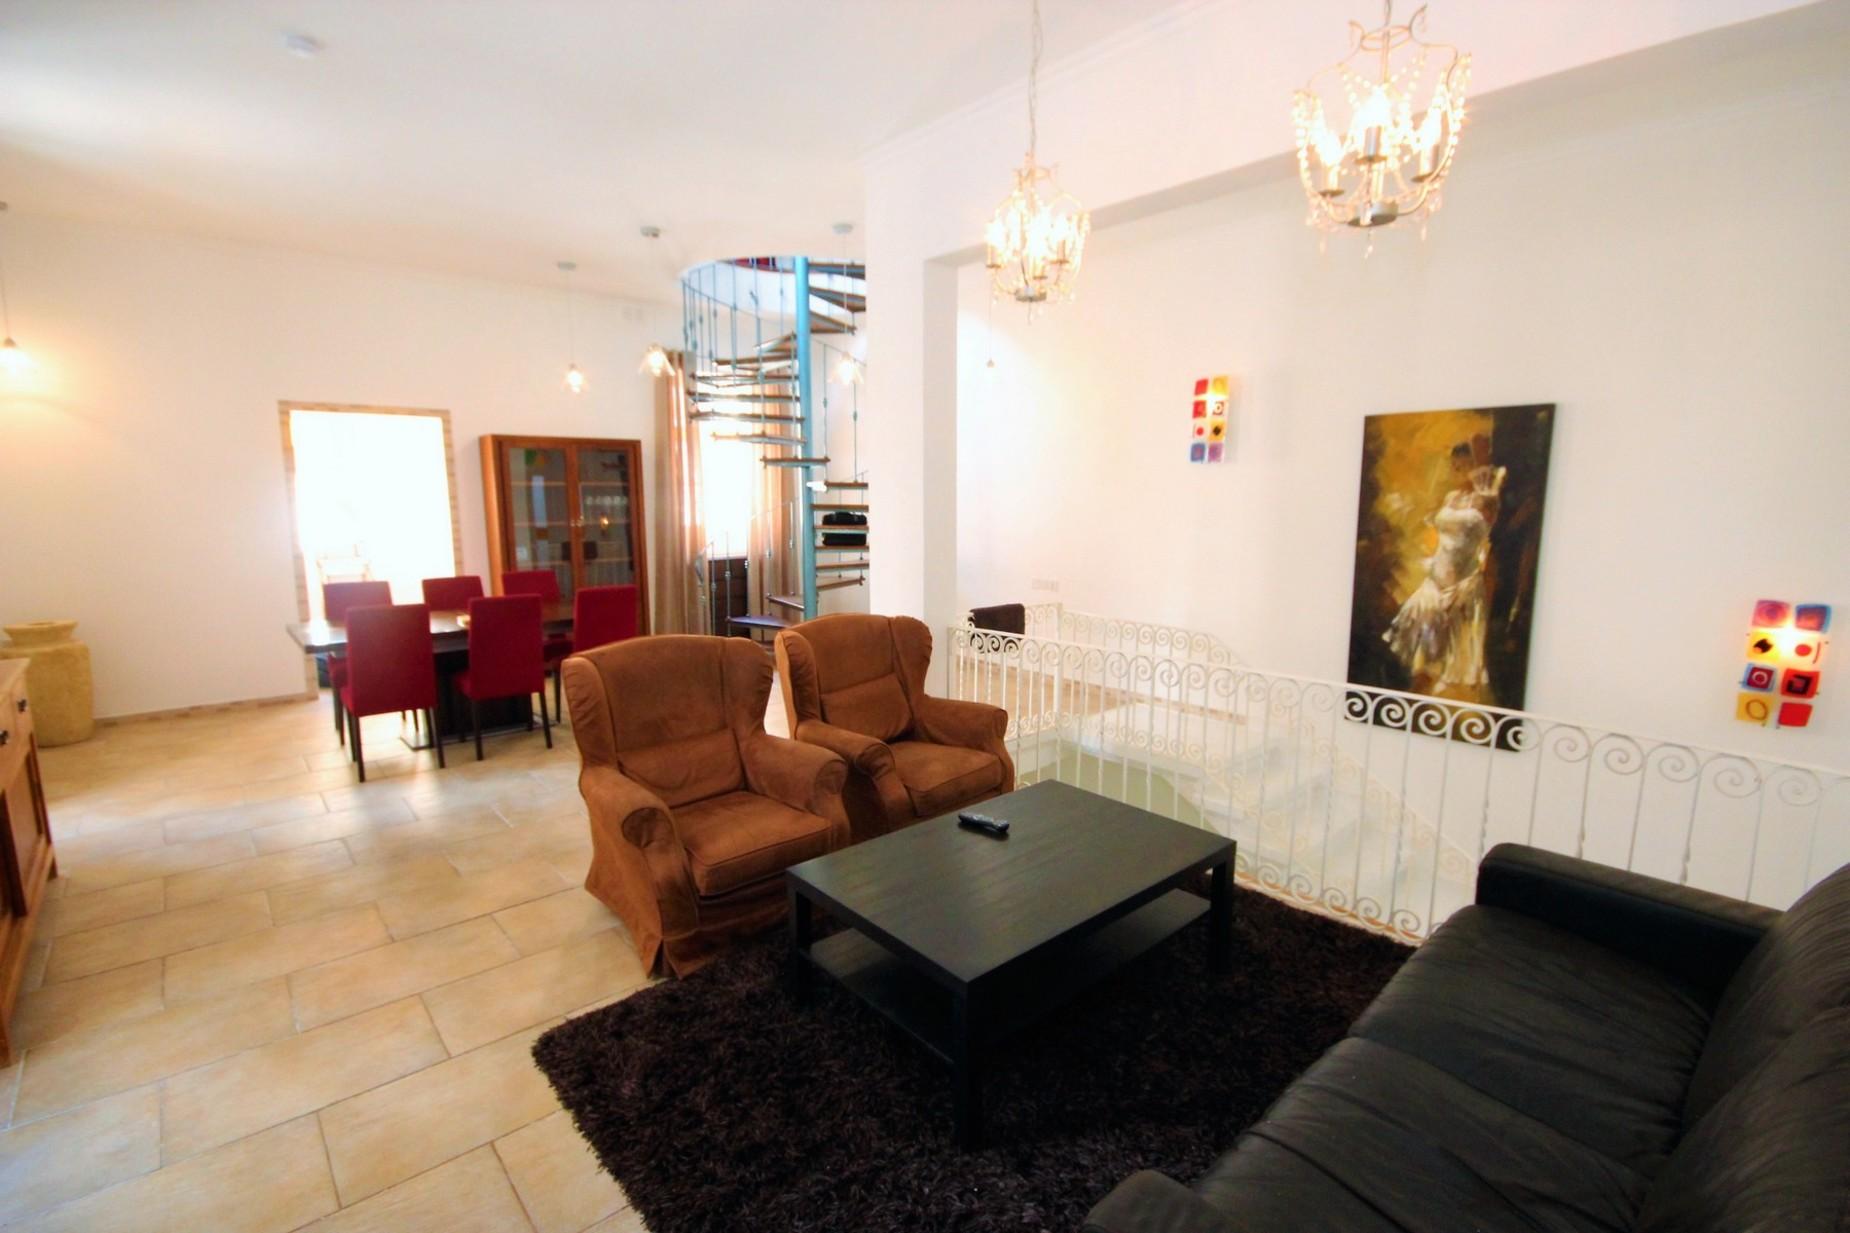 3 bed Town House For Rent in Gzira, Gzira - thumb 3